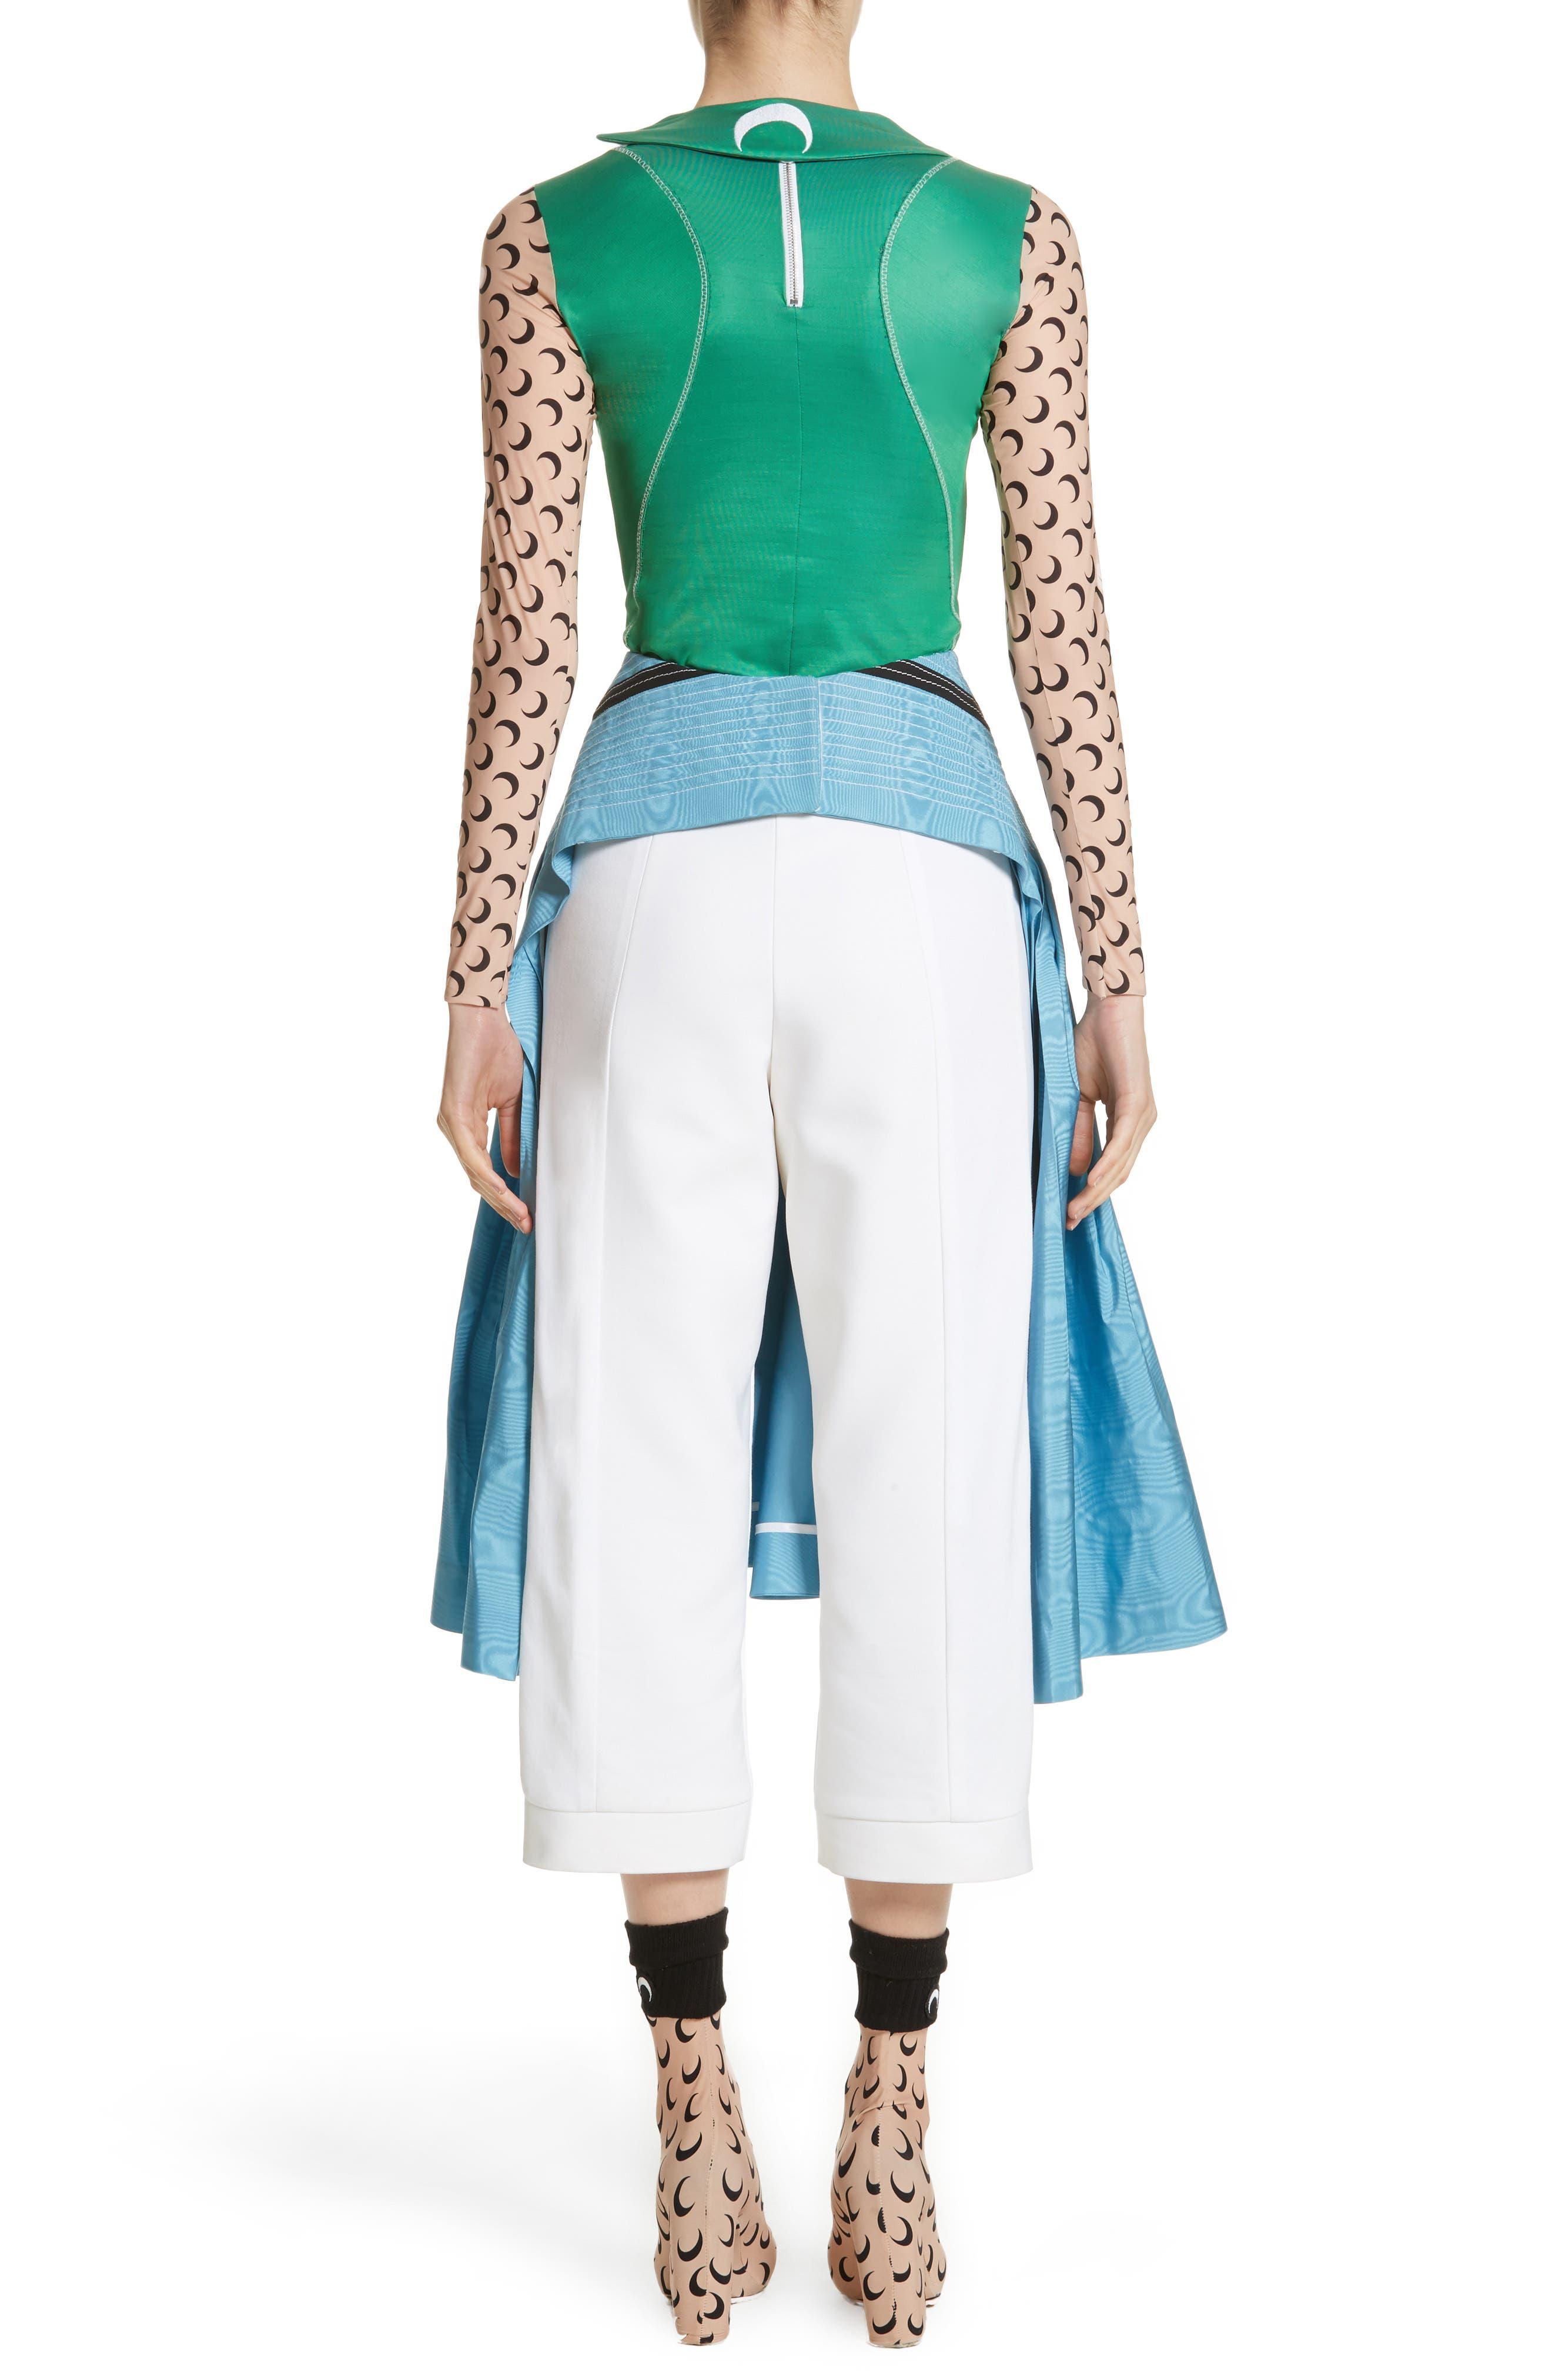 MARINE SERRE Pleated Moiré Dress, Main, color, 460